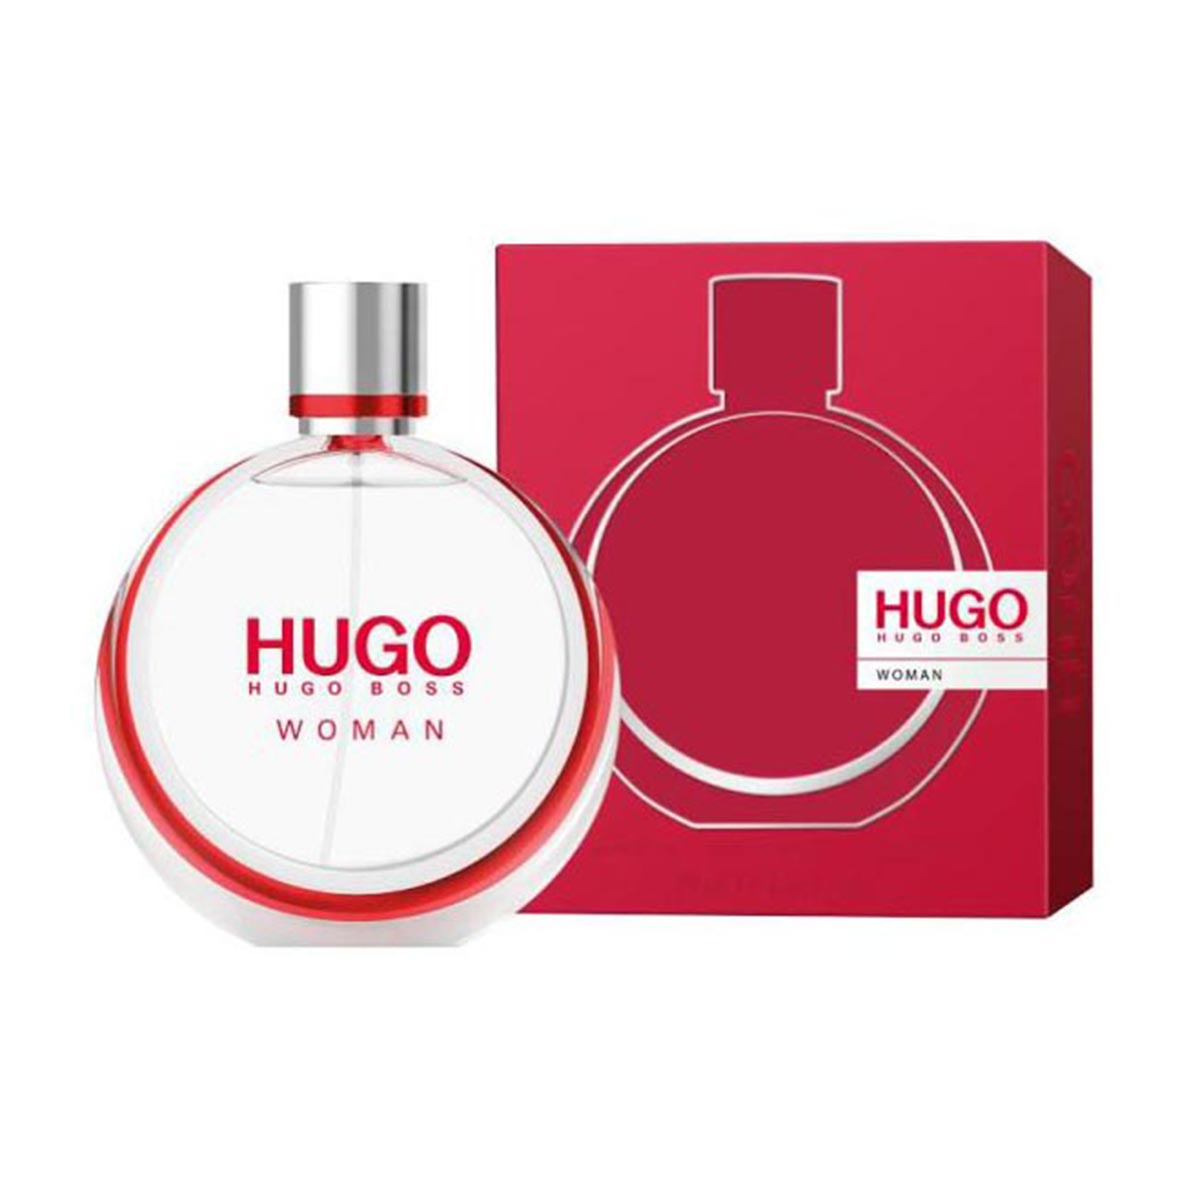 Hugo boss woman eau de parfum 30ml vaporizador